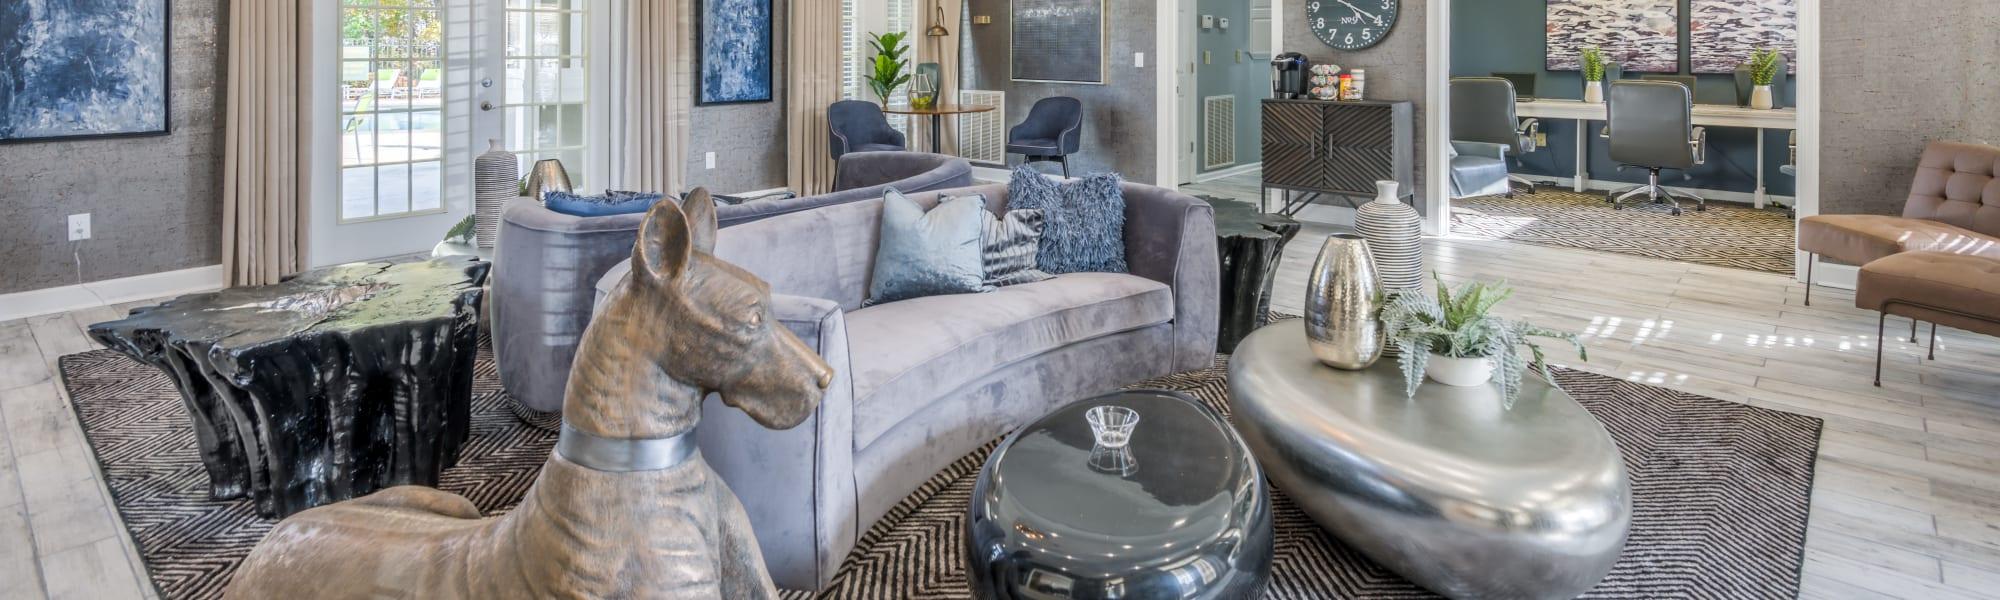 Virtual tours of One Rocky Ridge Apartment Homes in Douglasville, Georgia